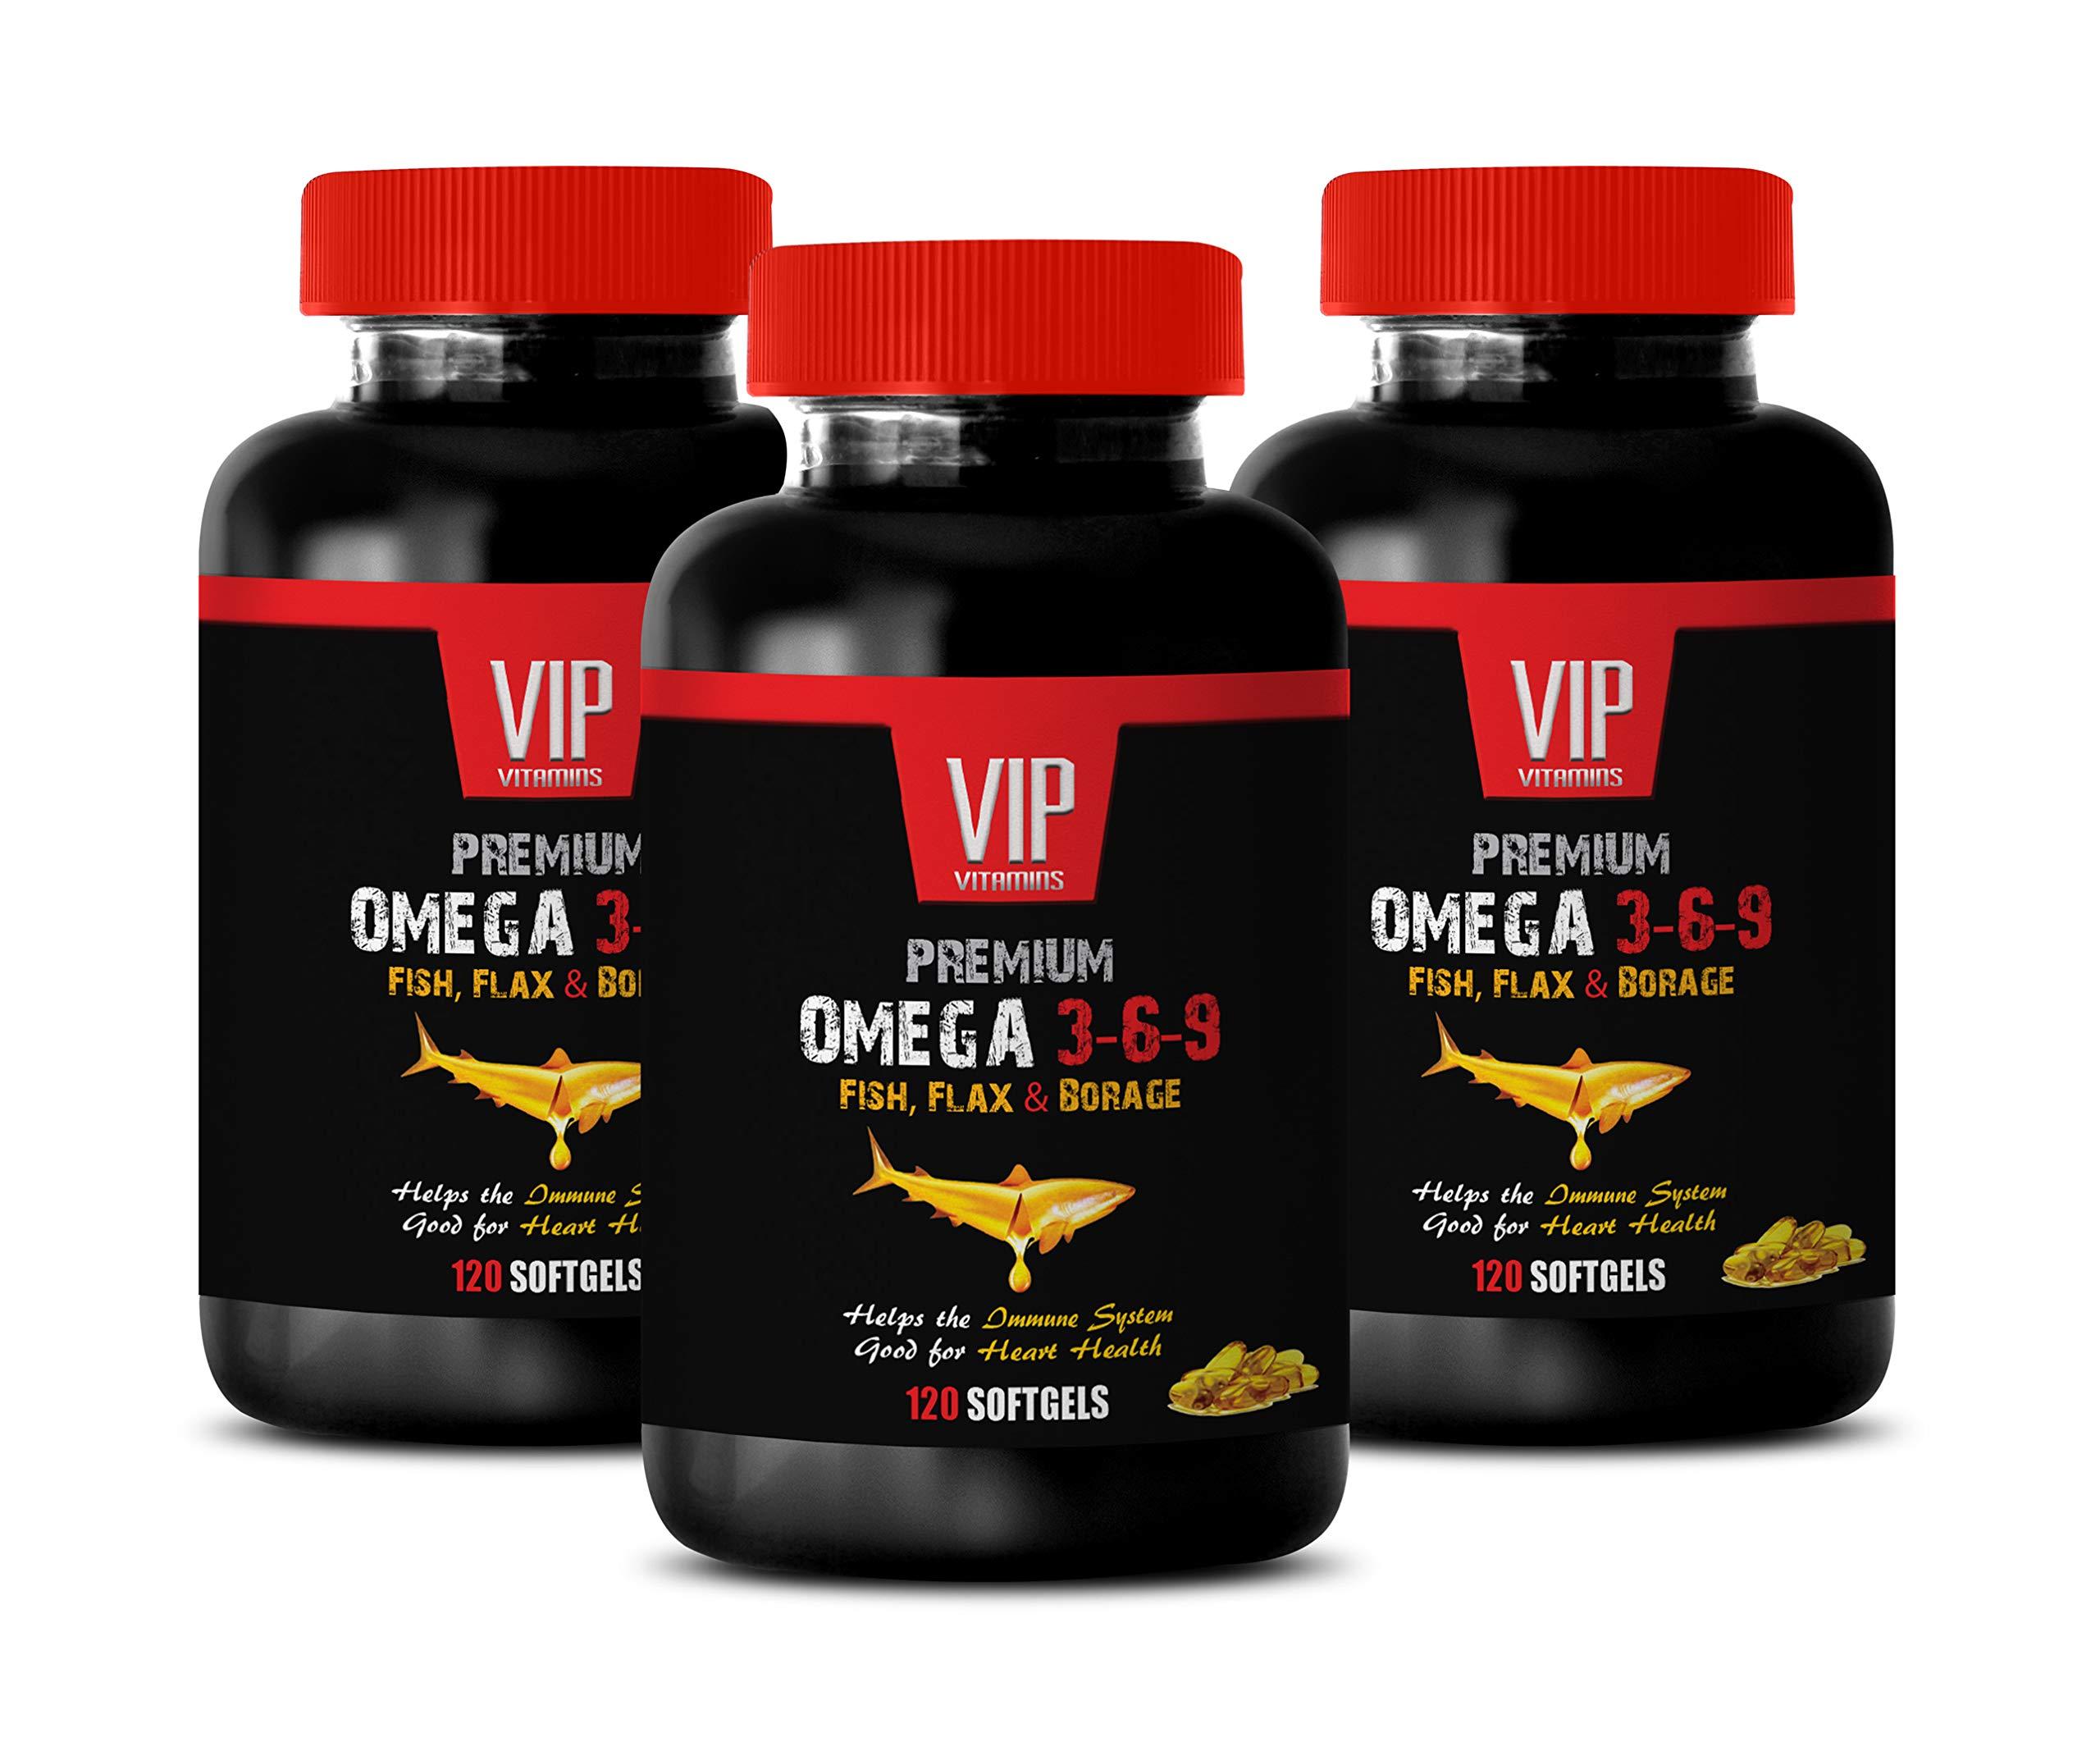 Immunity Booster Vitamins - Omega 3 6 9 Premium - Fish, Flax & Borage - 3-6-9 Omega Fish Oil - 3 Bottles 360 Softgels